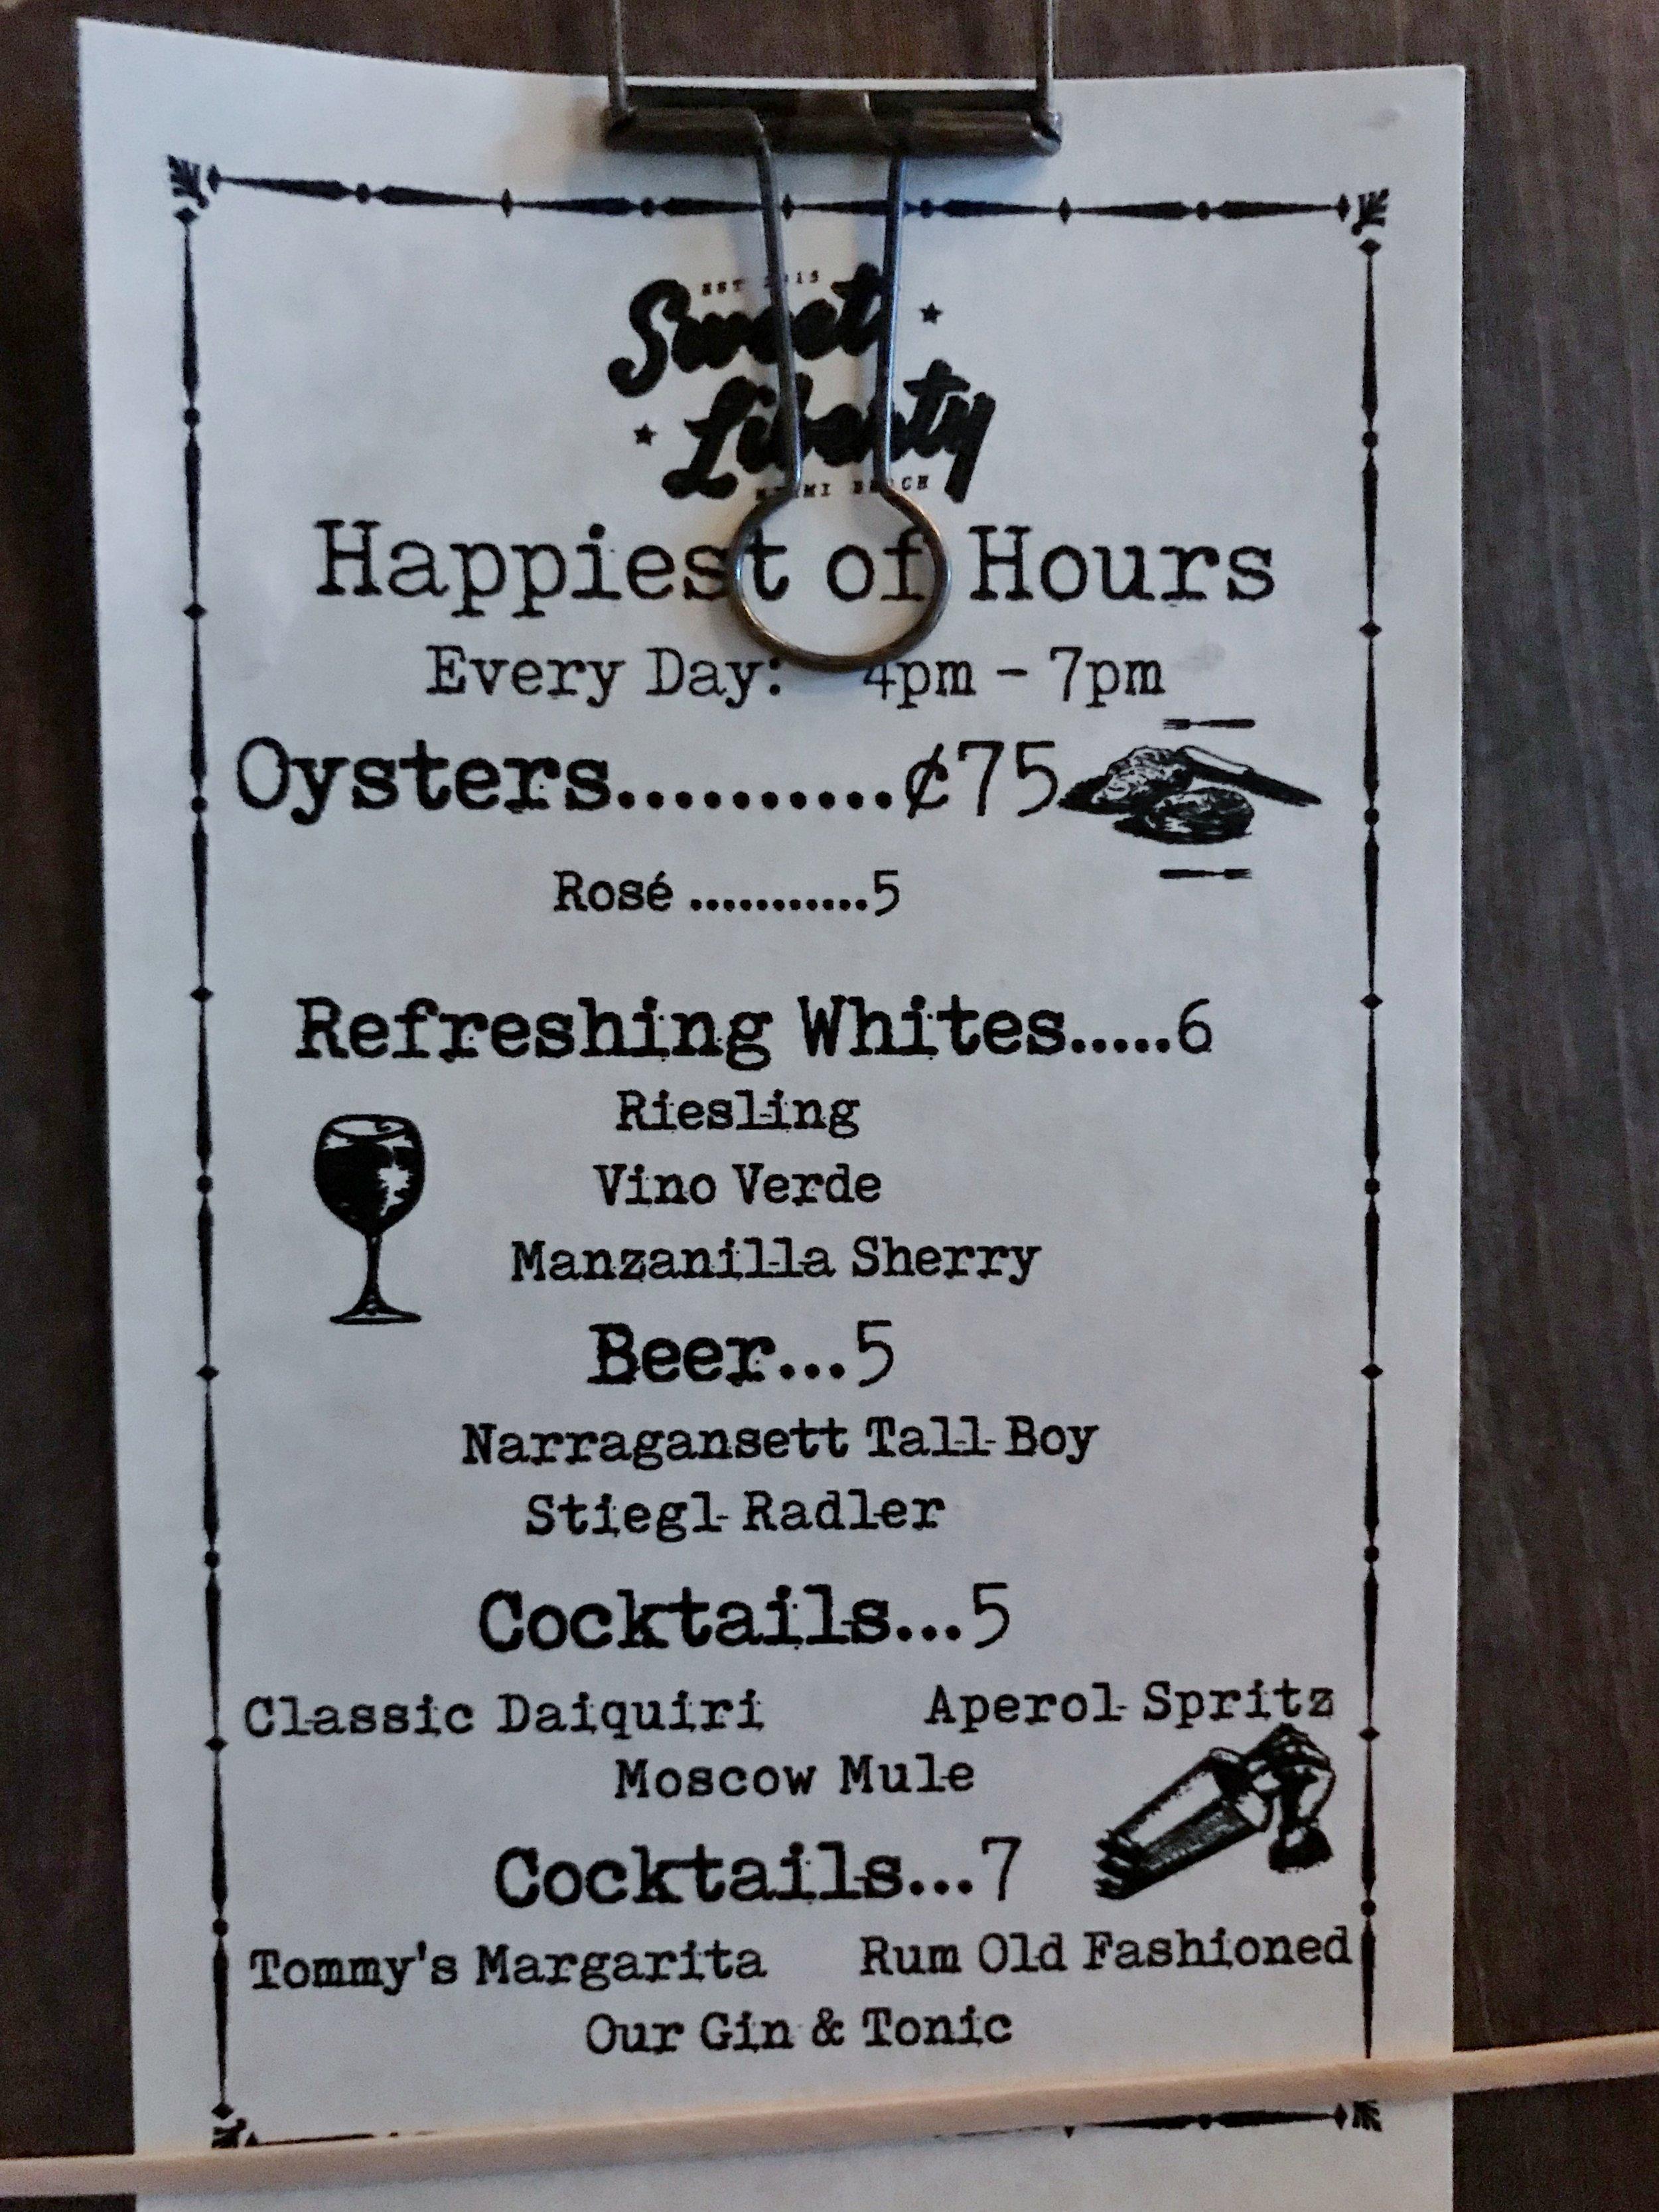 OYSTERS &classic daiquiri on sweet liberty's happy hour menu